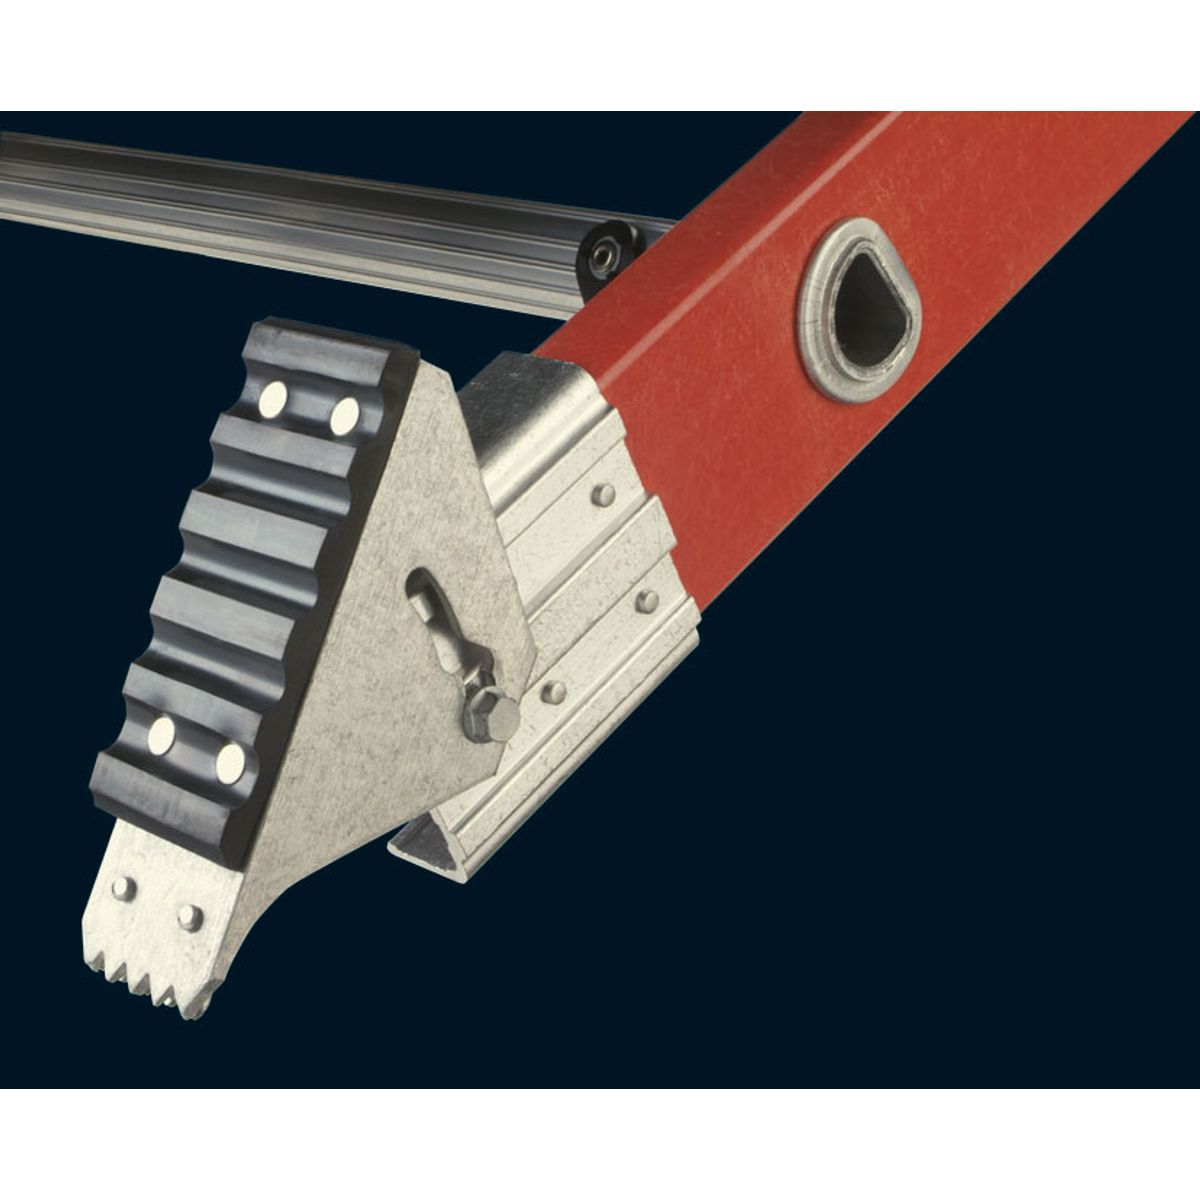 D6240 2 Extension Ladders Werner Us